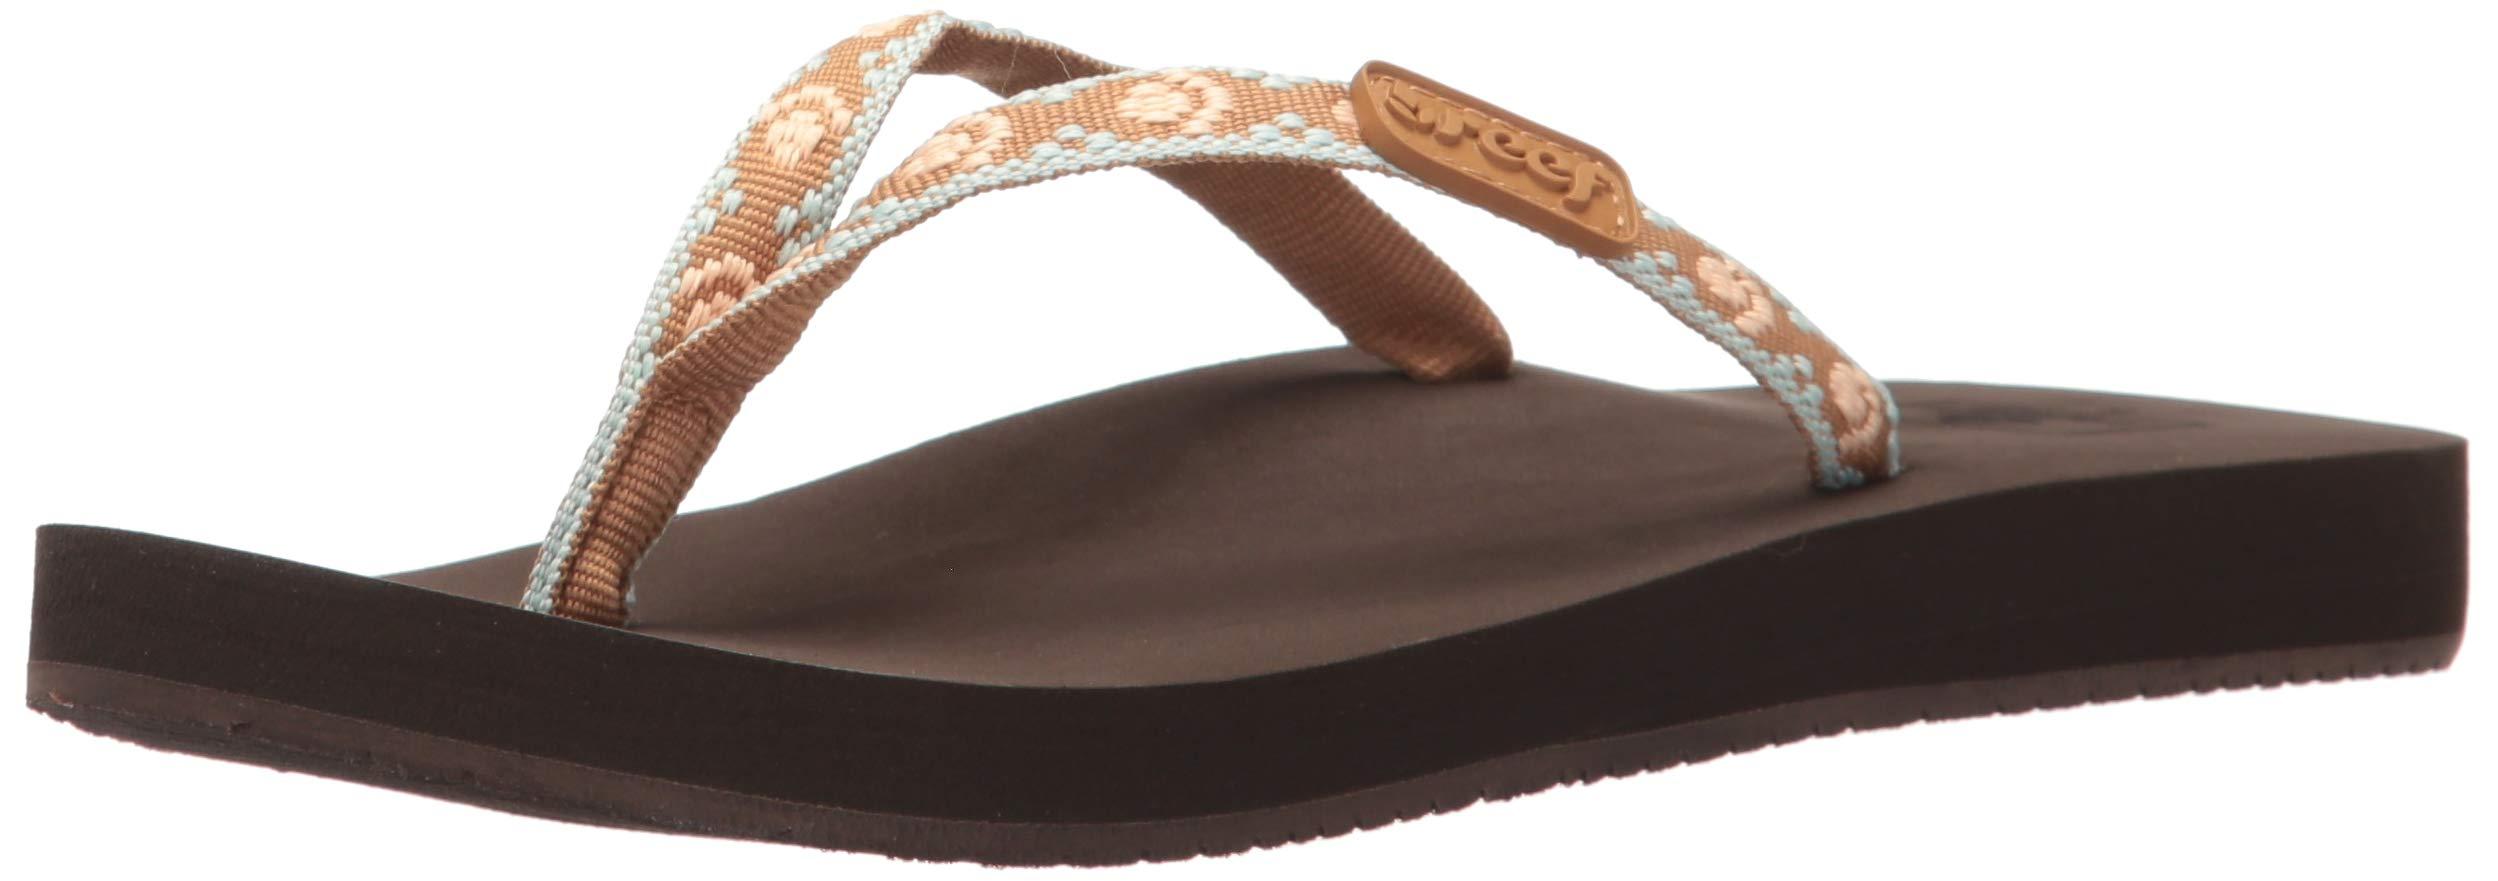 02de4dcac3e13 Reef Womens Sandals Ginger